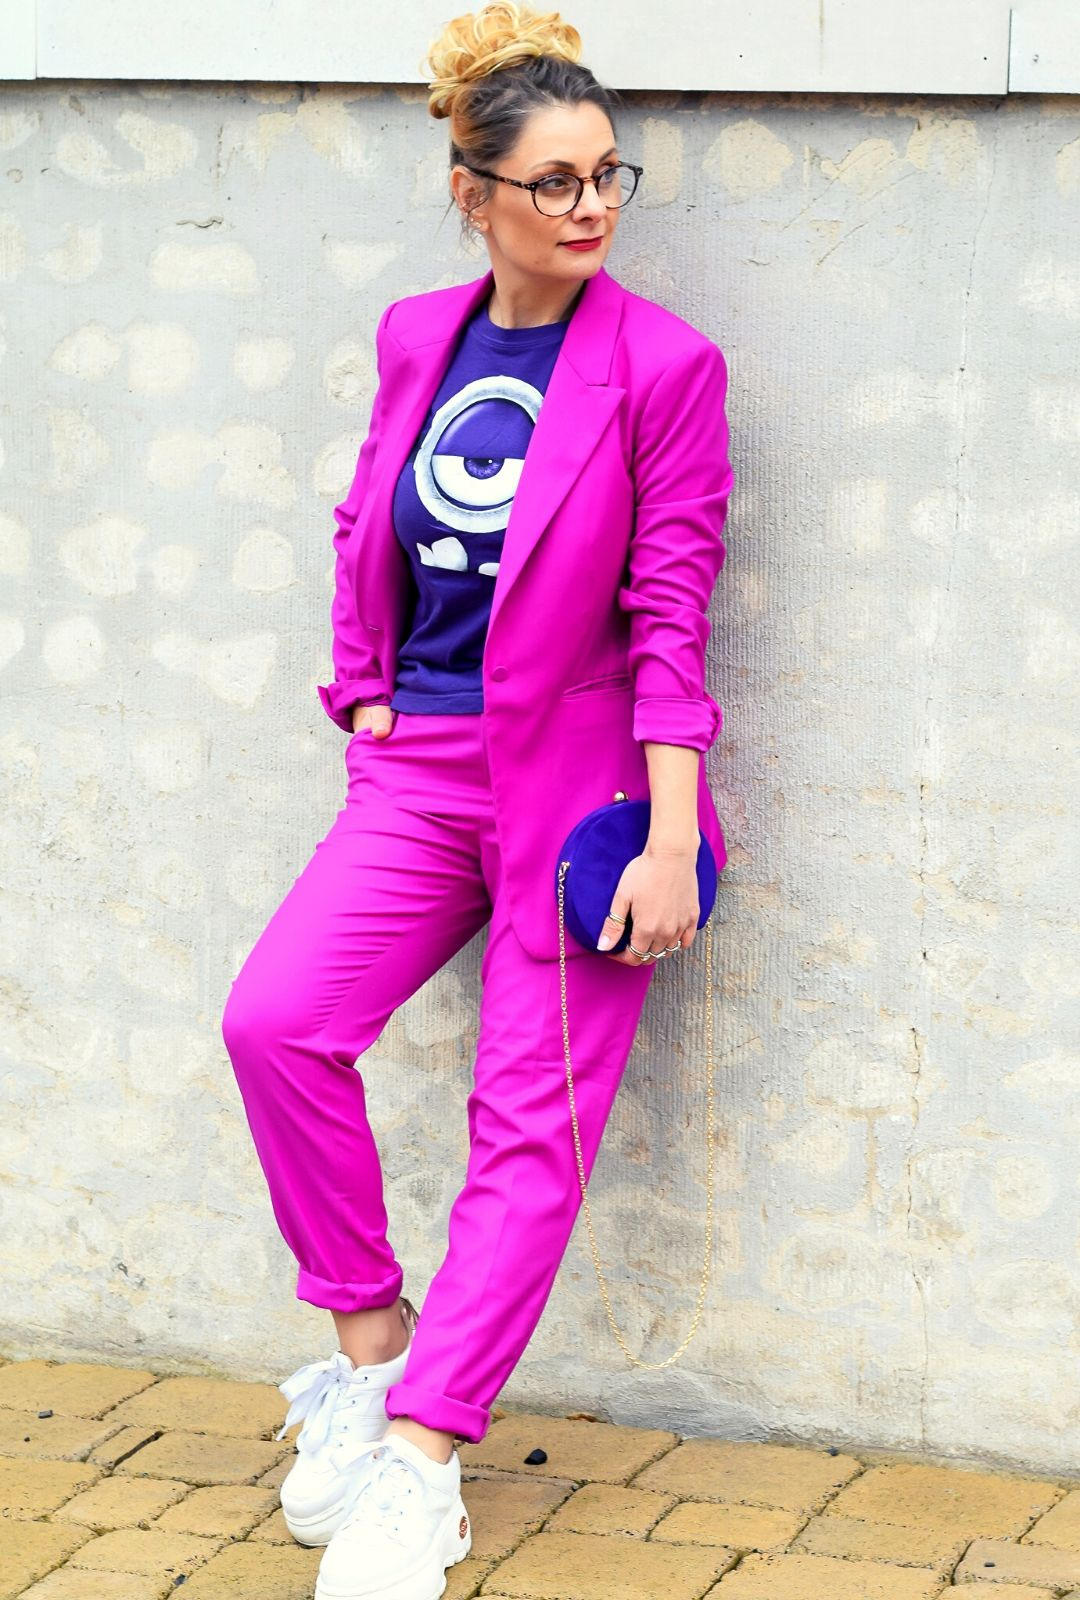 Violett-Pink-Hosenanzug-Outfit